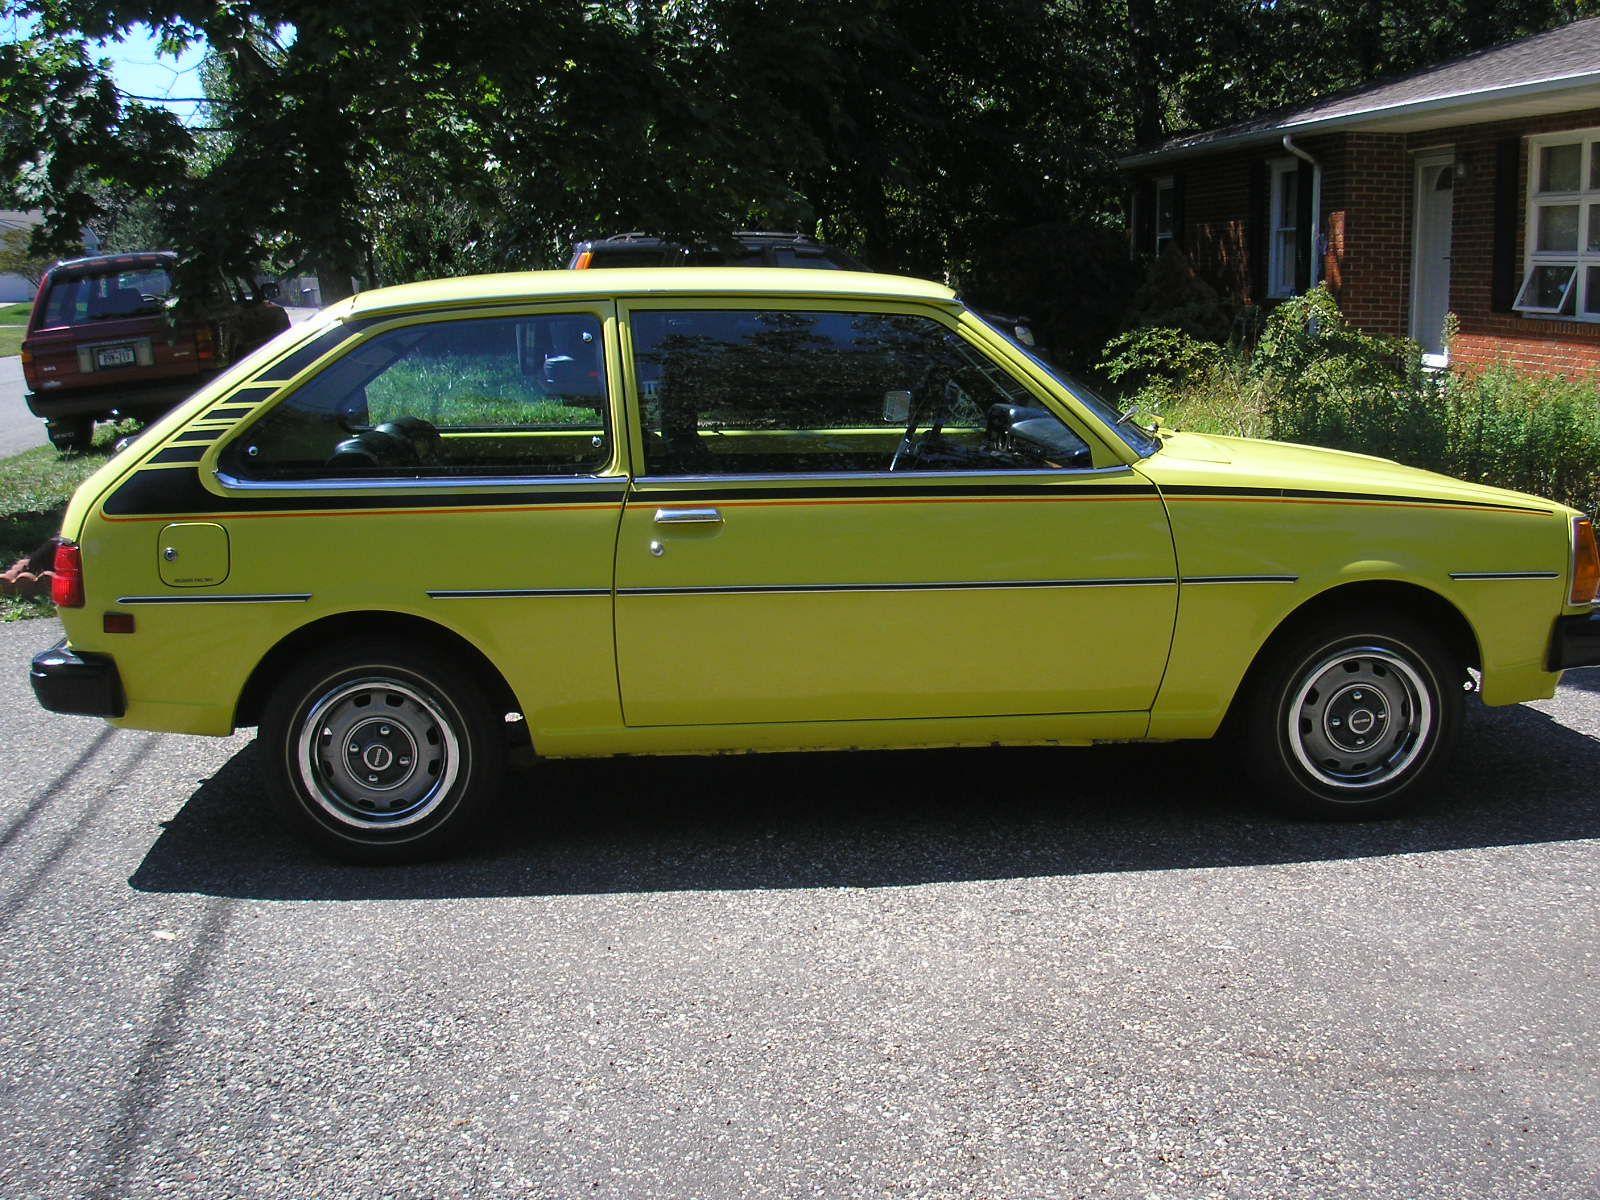 1980 Mazda GLC --- My Tootsie!! | A Blast from the past ...